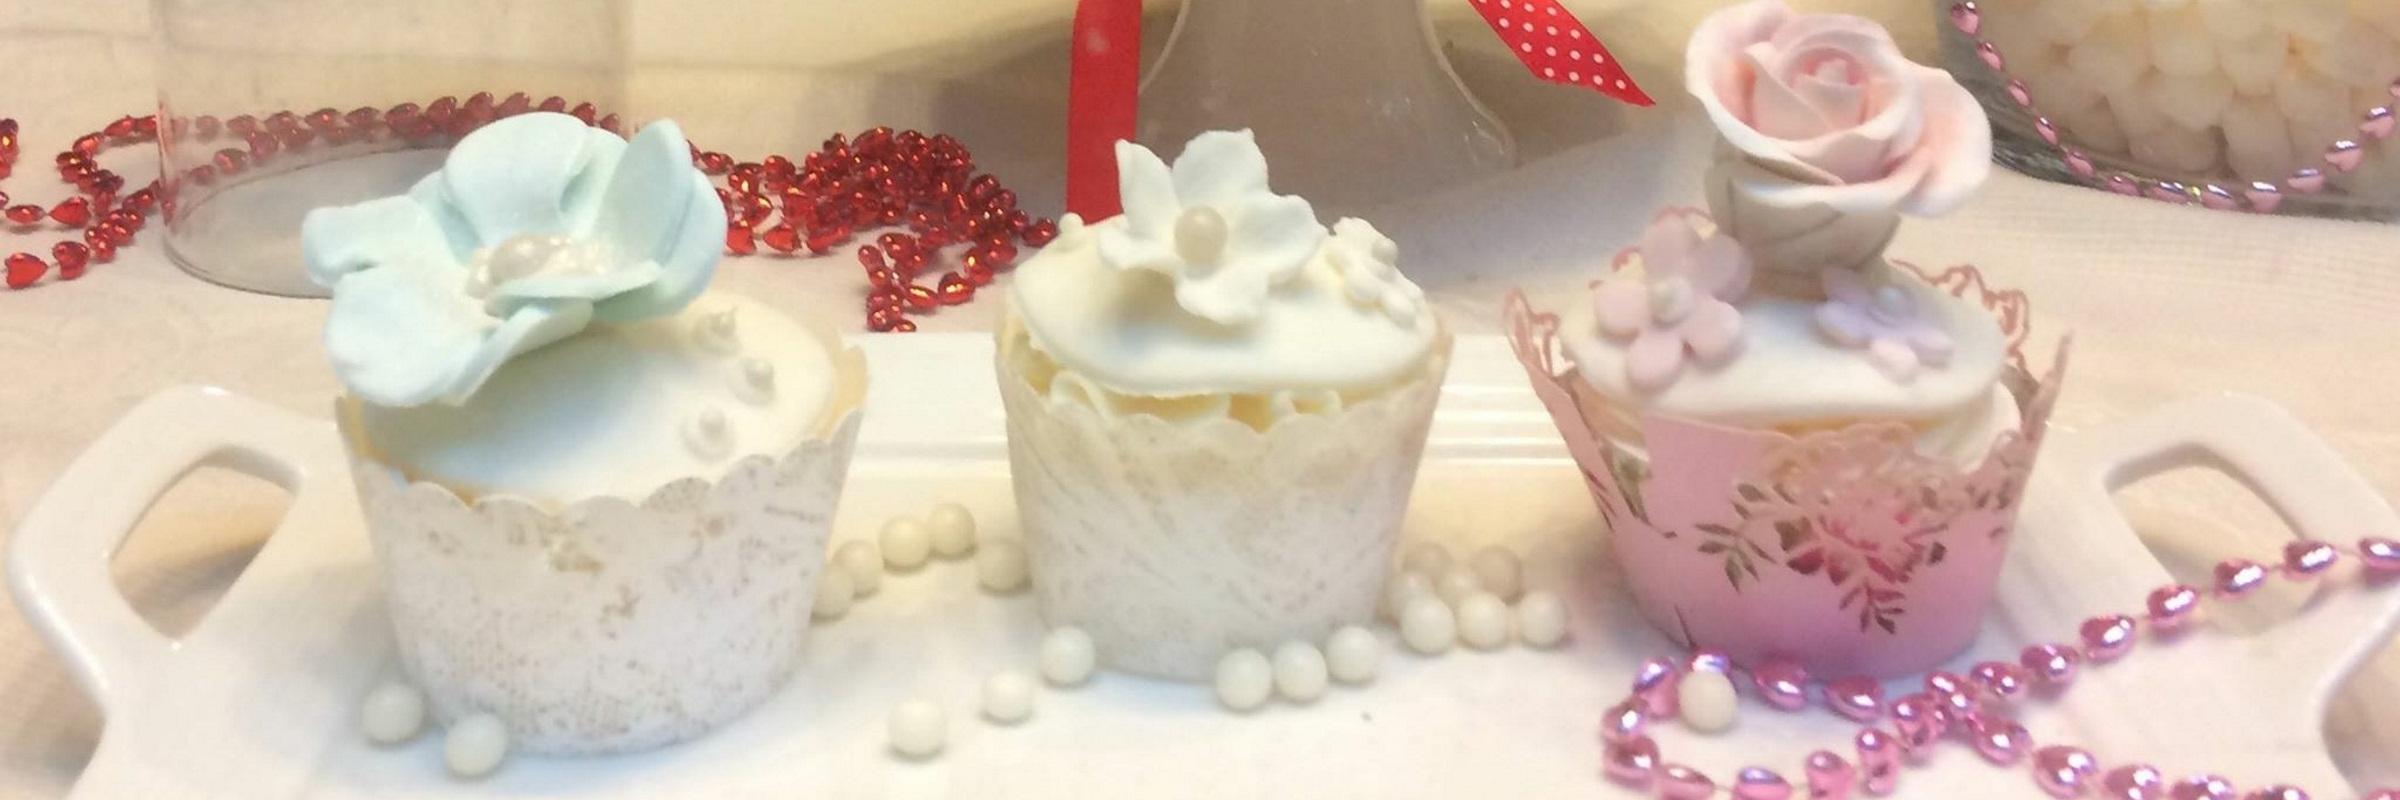 euorpecakes-cupcakes-weddingcakes